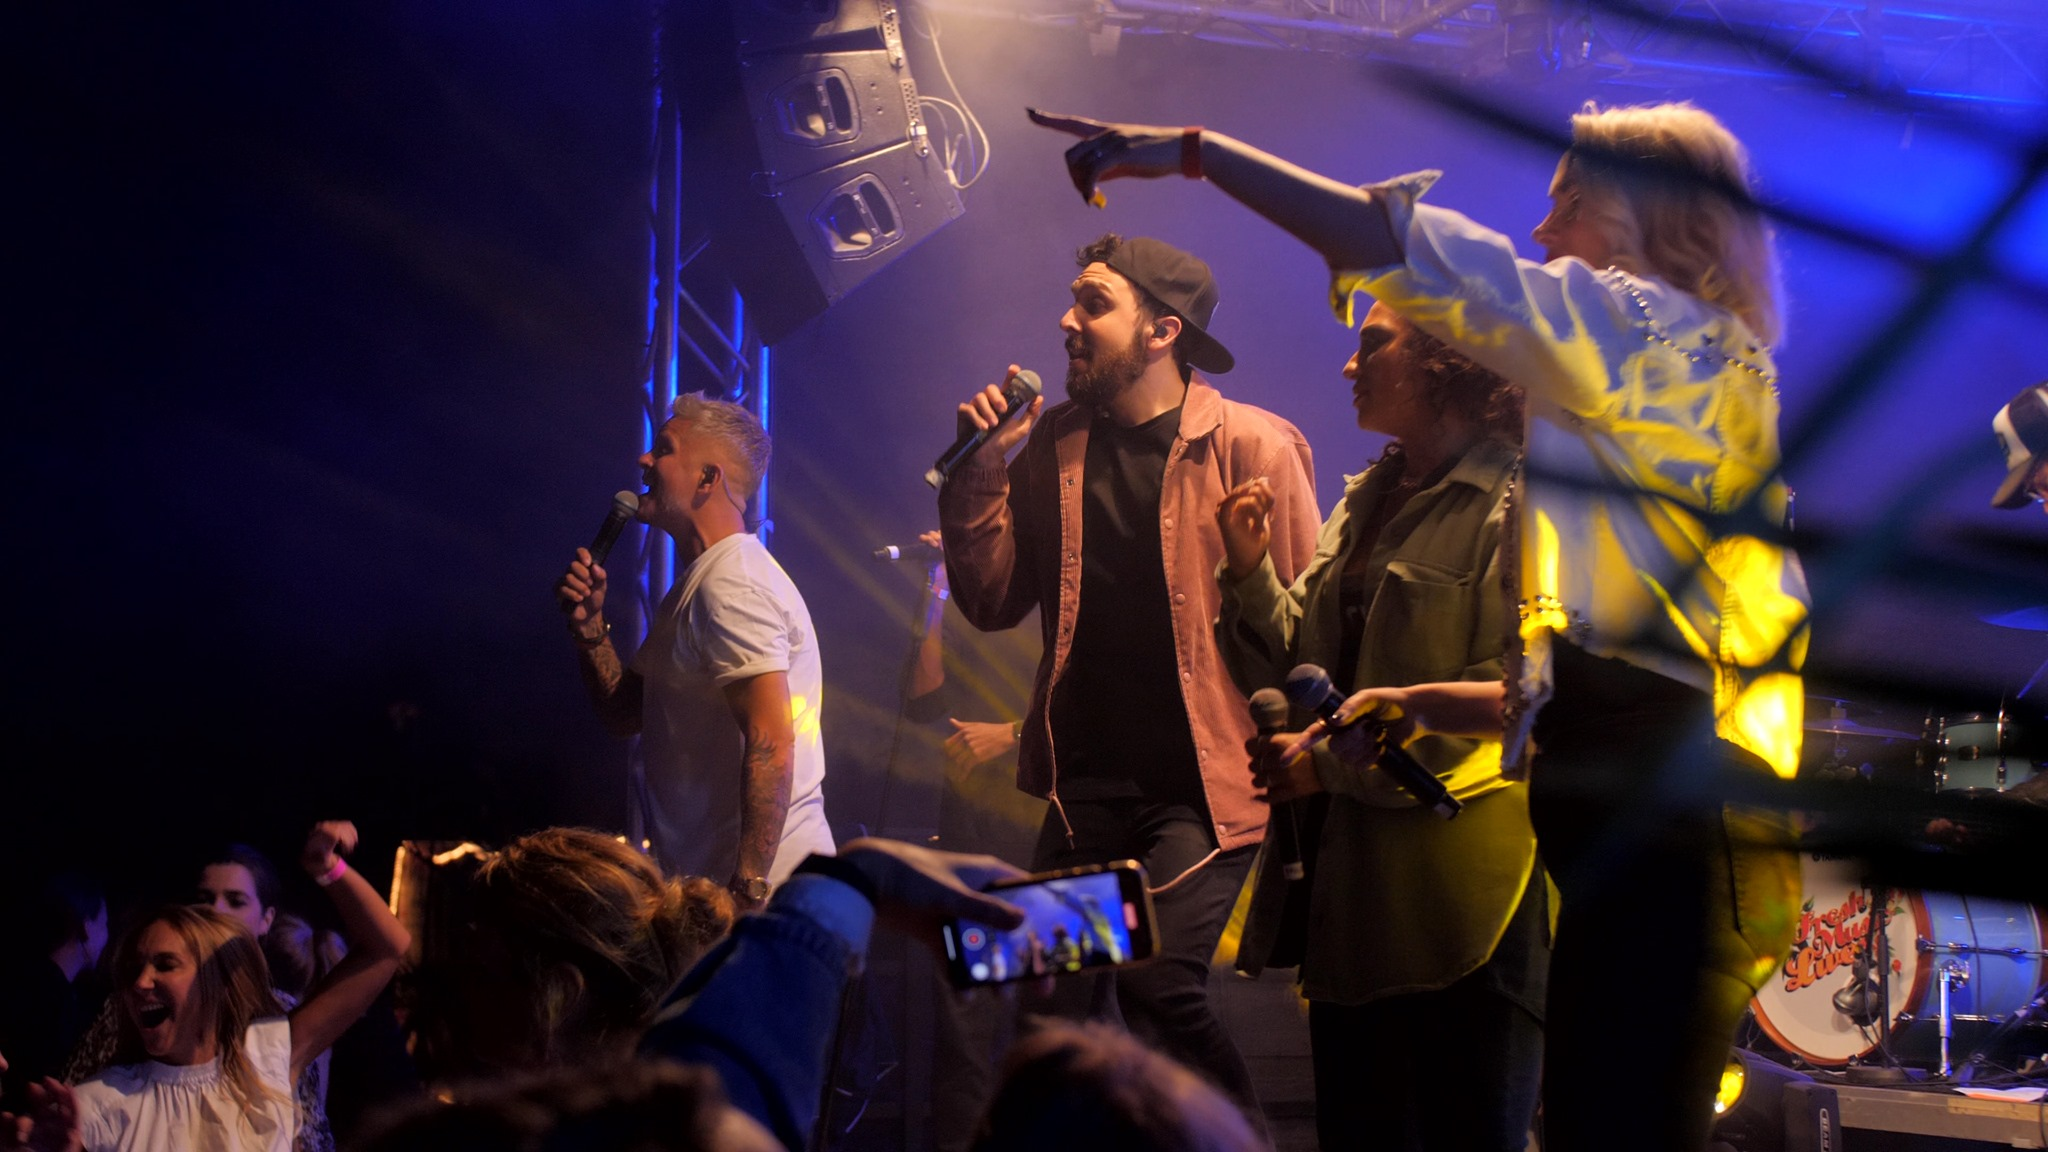 FreshMusicLive-Benefizkonzert-Beachclub-Düsseldor2